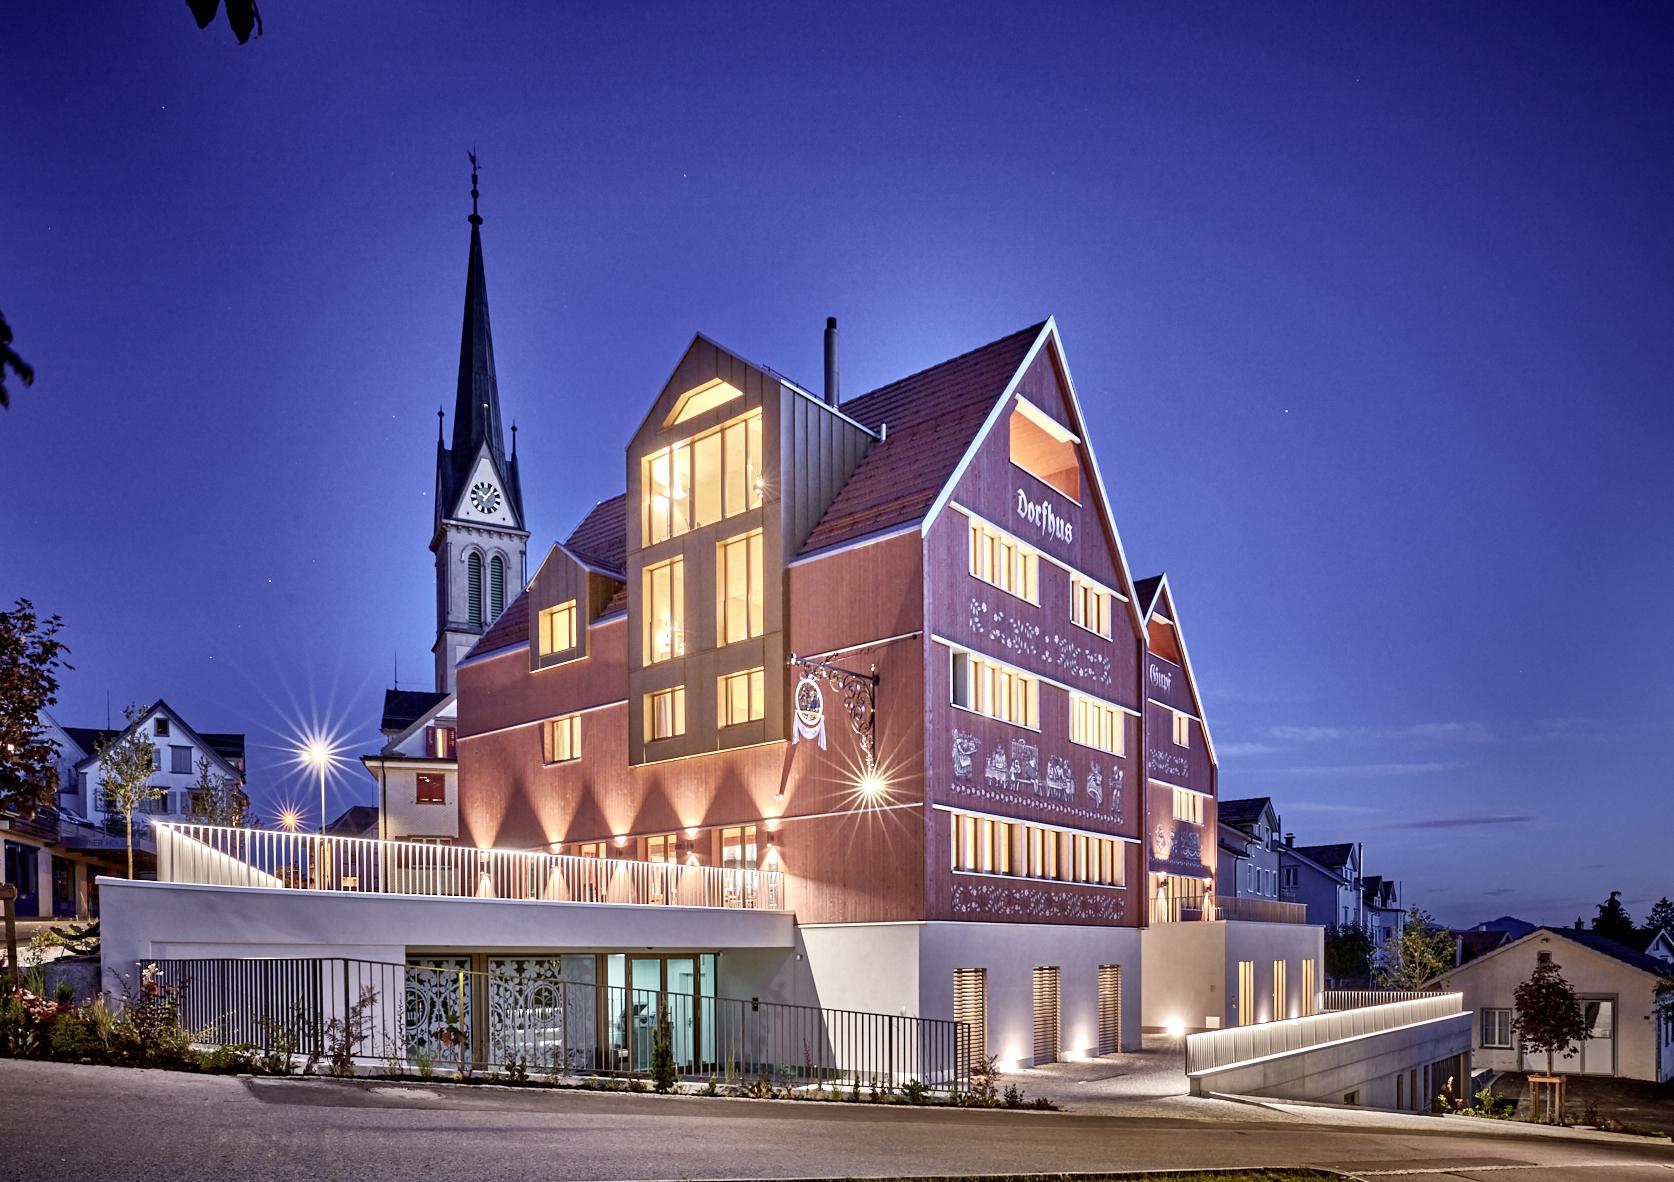 Gasthaus Gupf Rehtobel